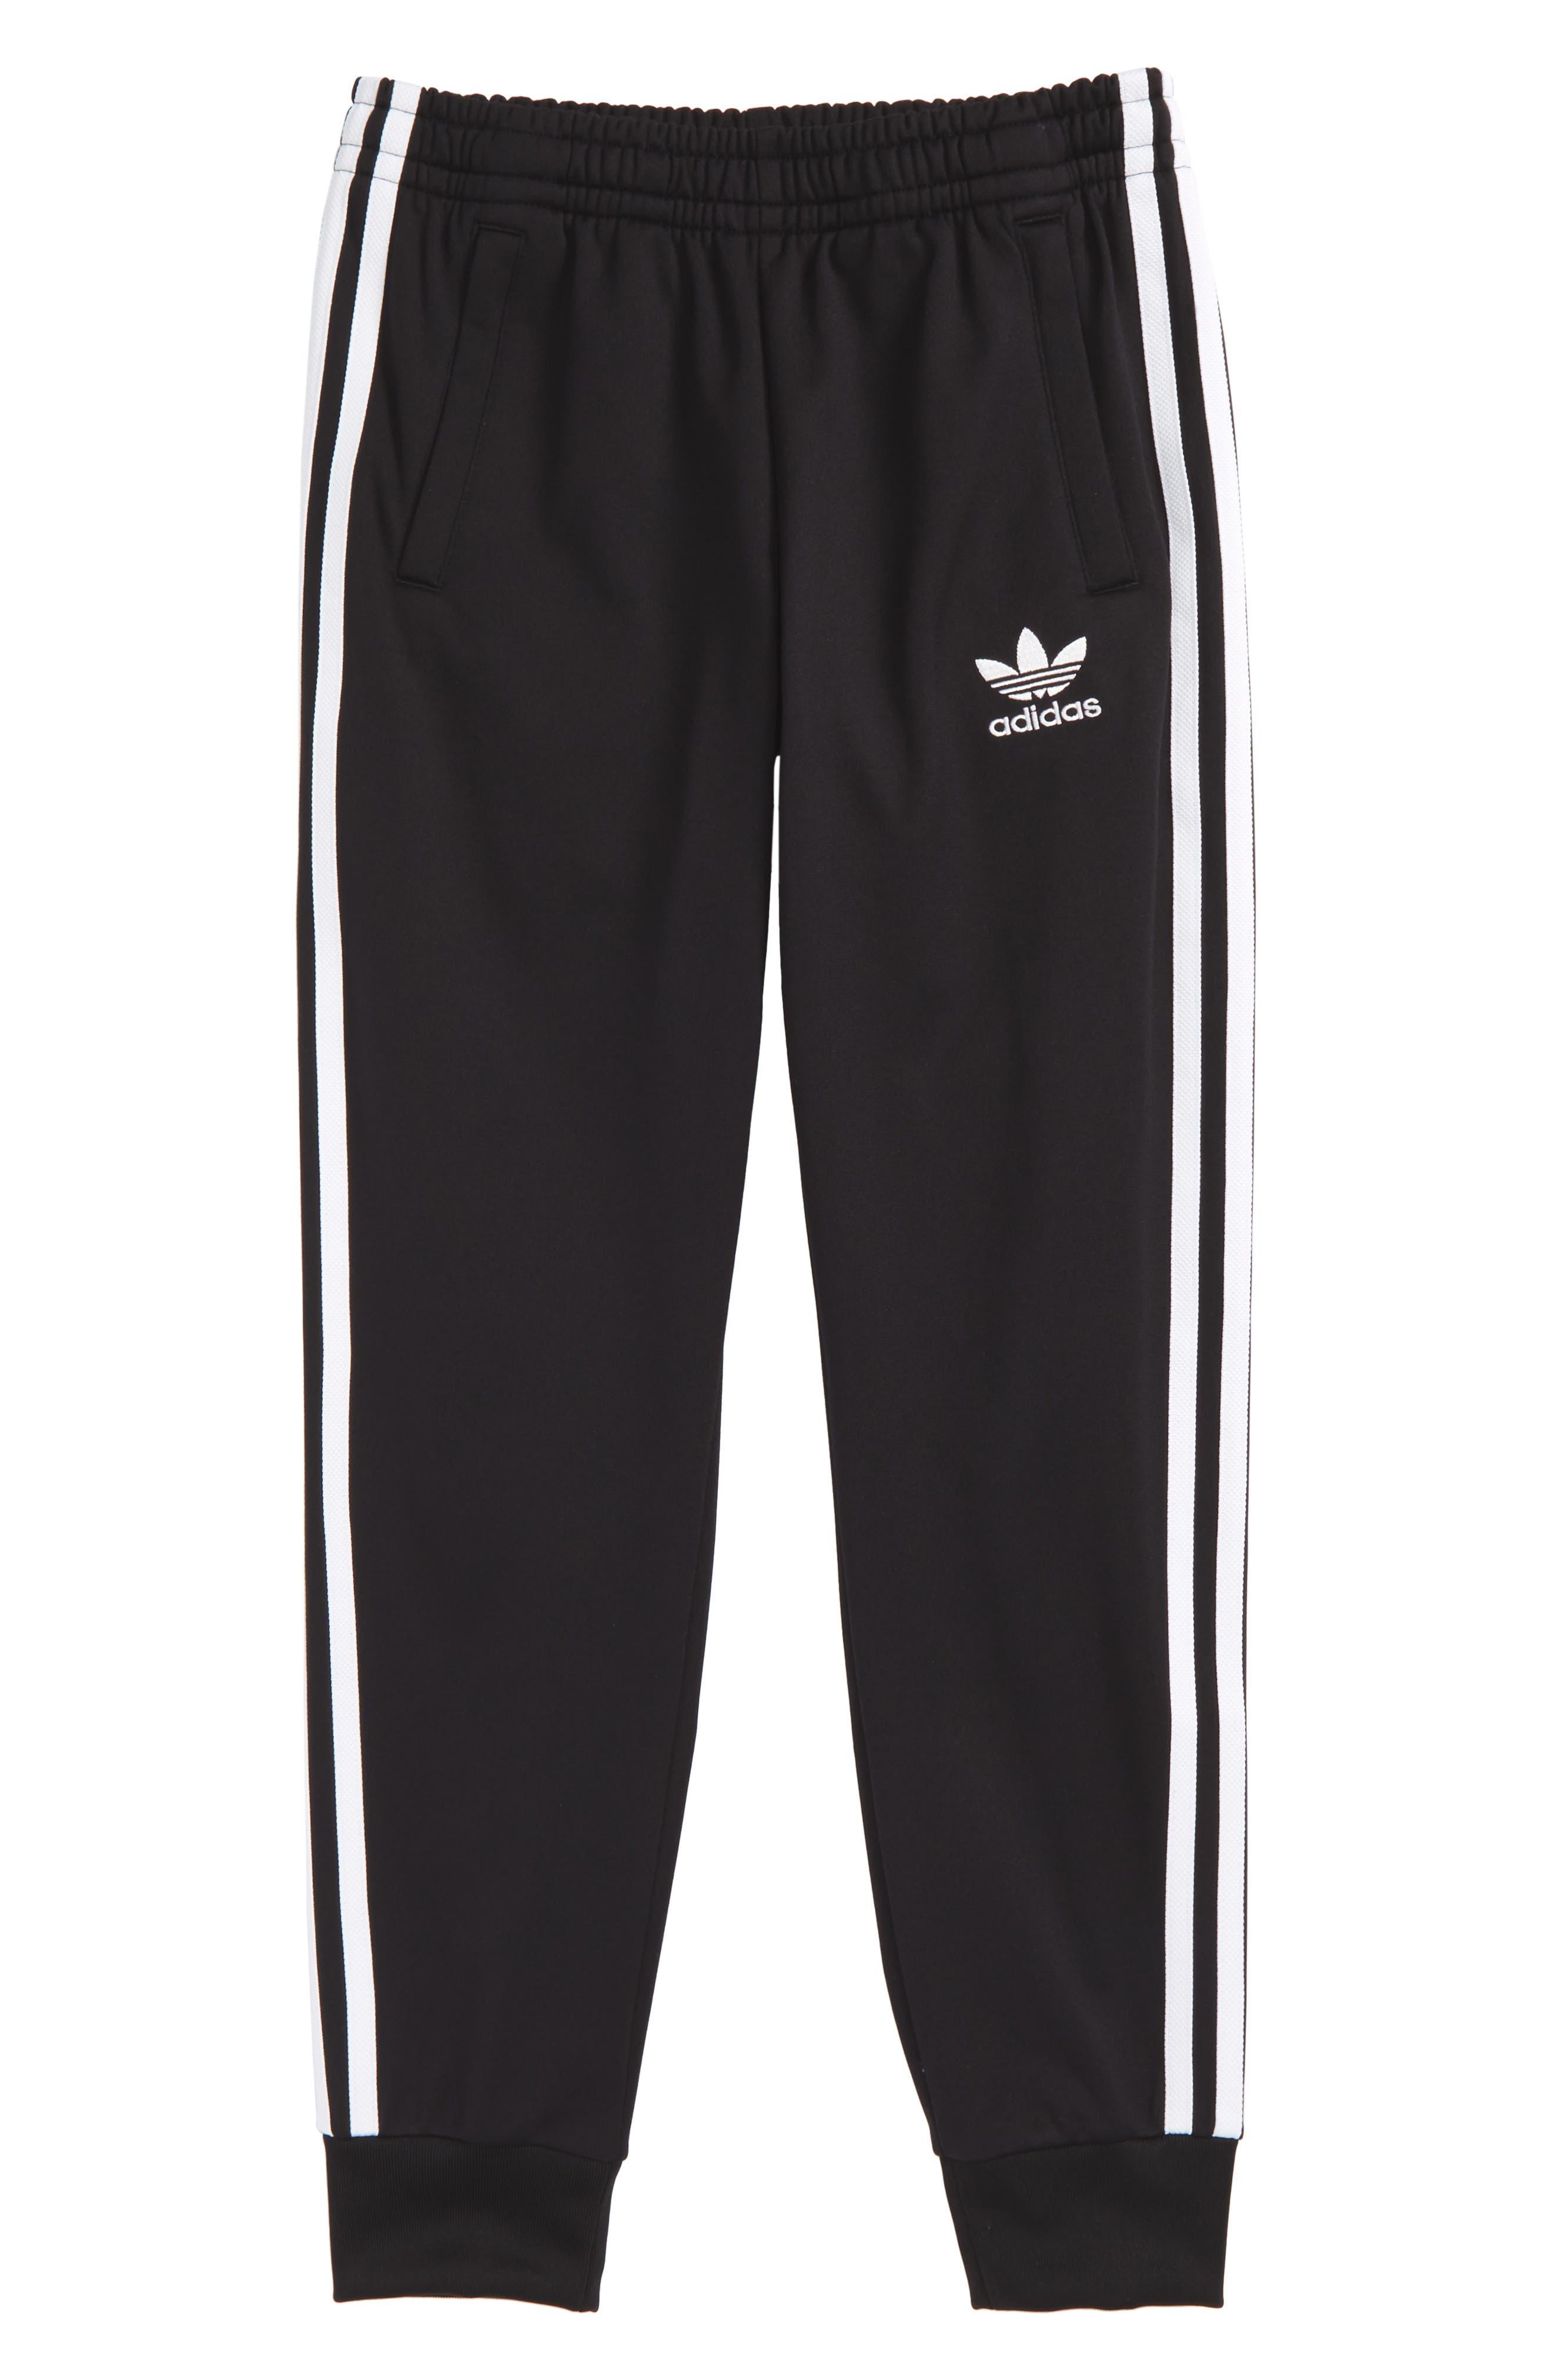 Alternate Image 1 Selected - adidas Originals Superstar Track Pants (Little Boys & Big Boys)